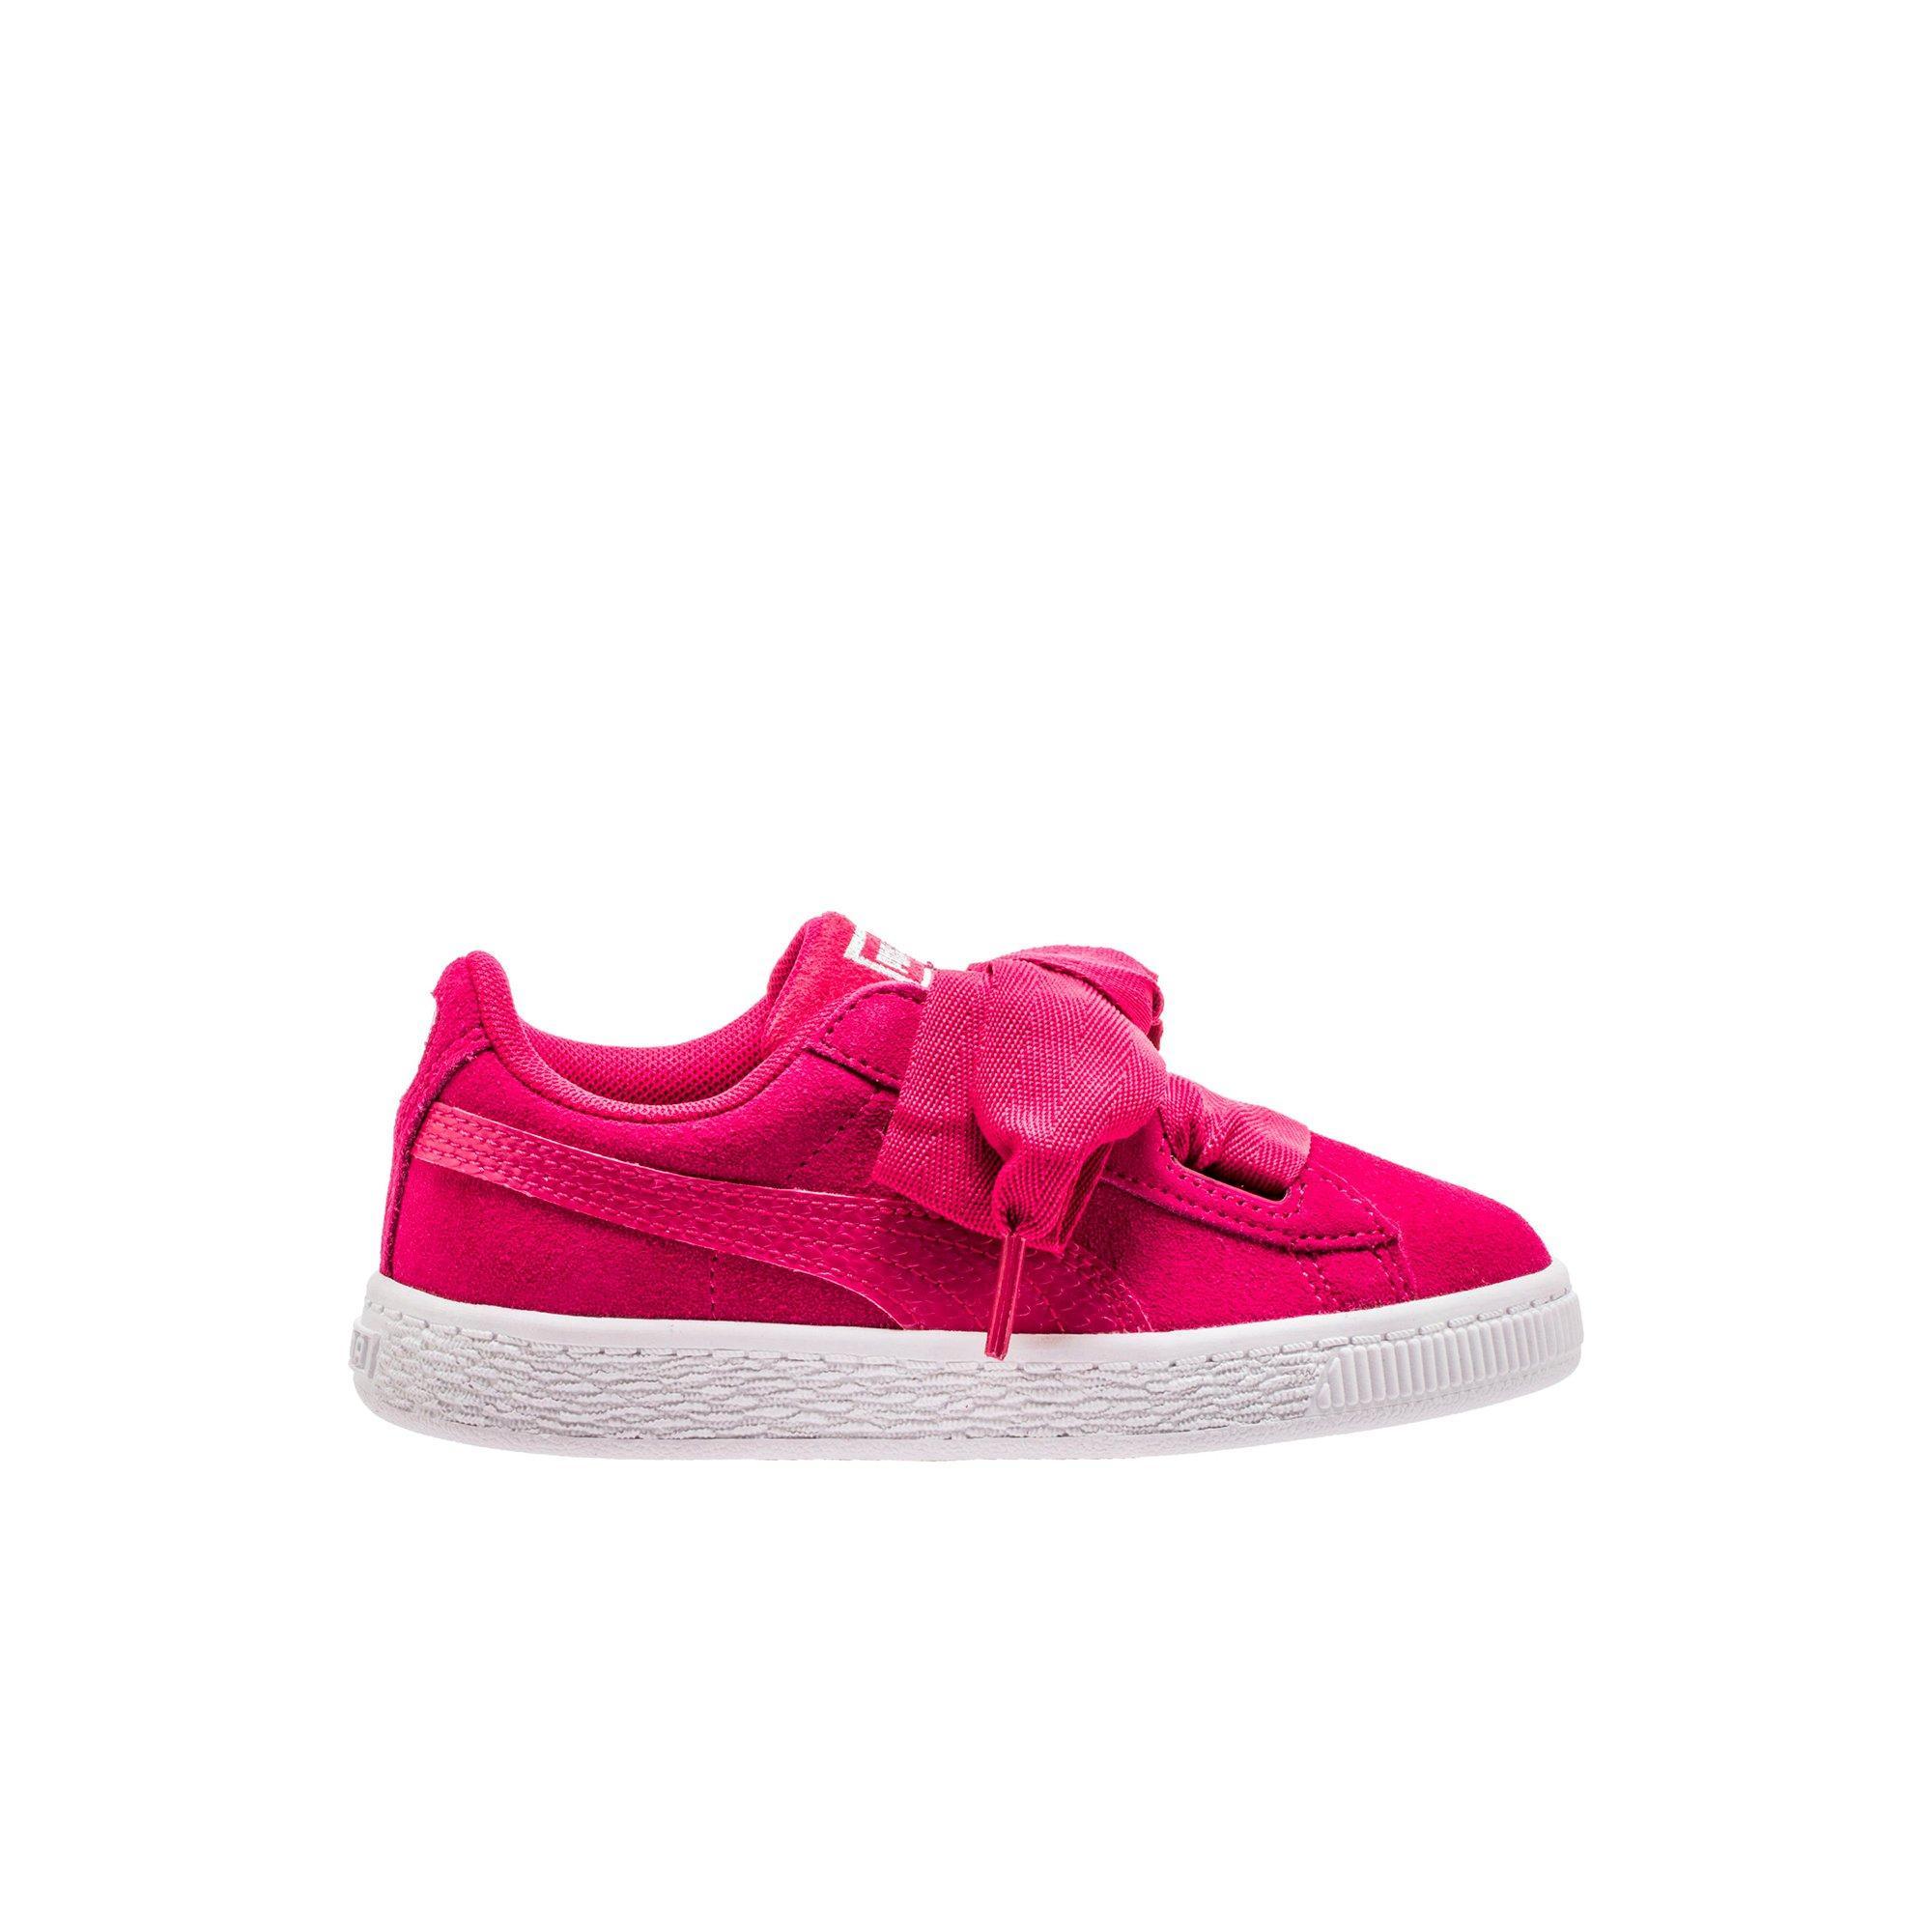 puma shoes pink and black. puma shoes pink and black l